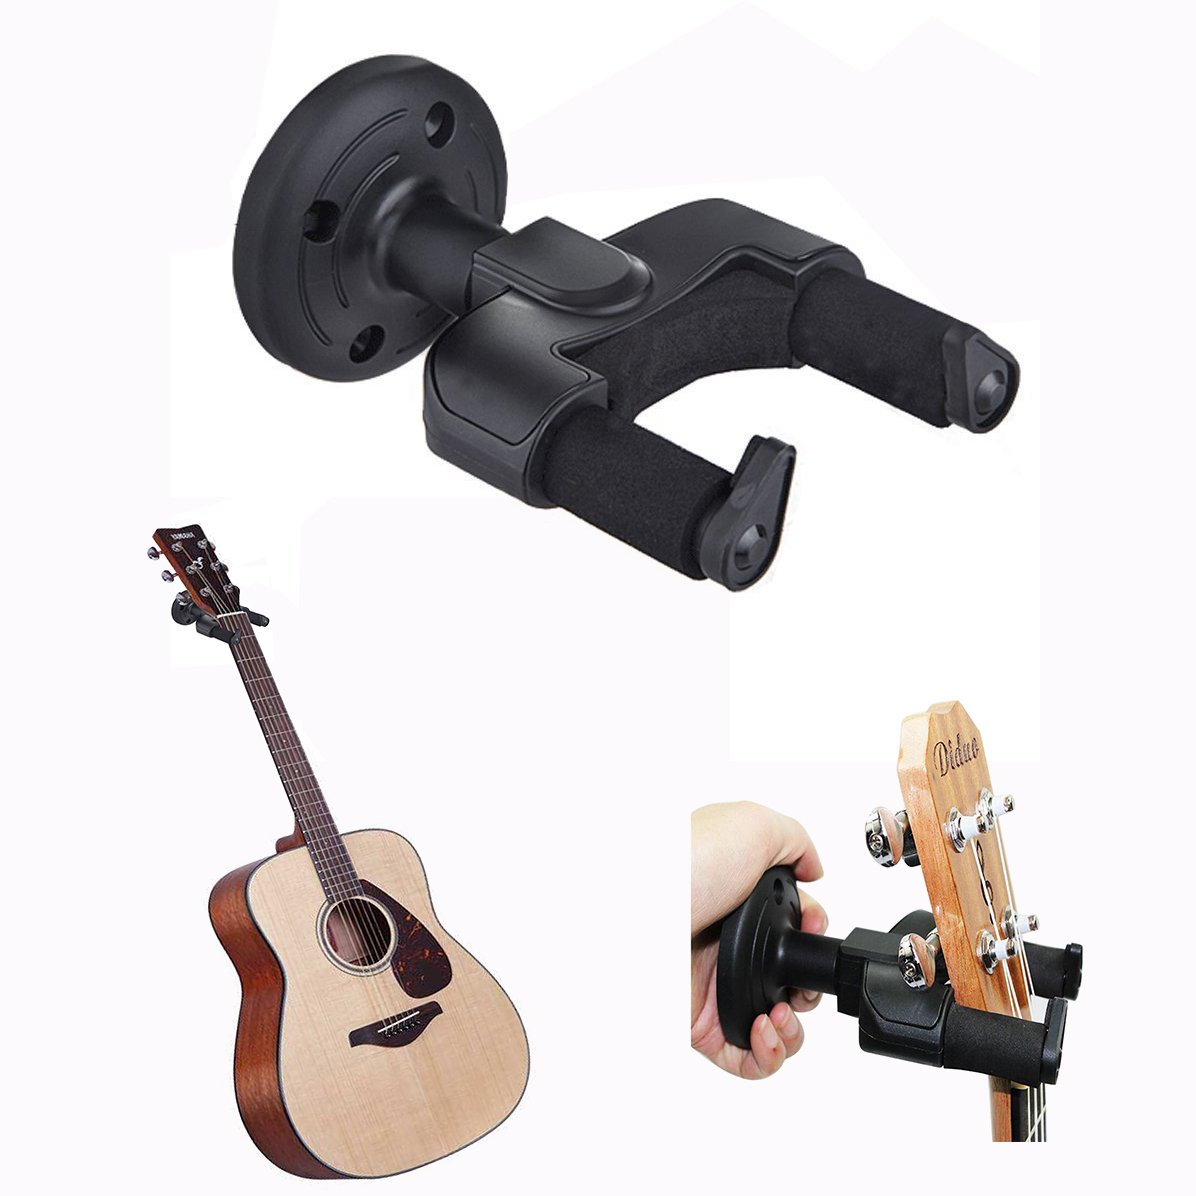 Cisixin Guitar Hanger Wall Mount Holder Rack Hook for Electric Acoustic Guitar Bass Ukulele